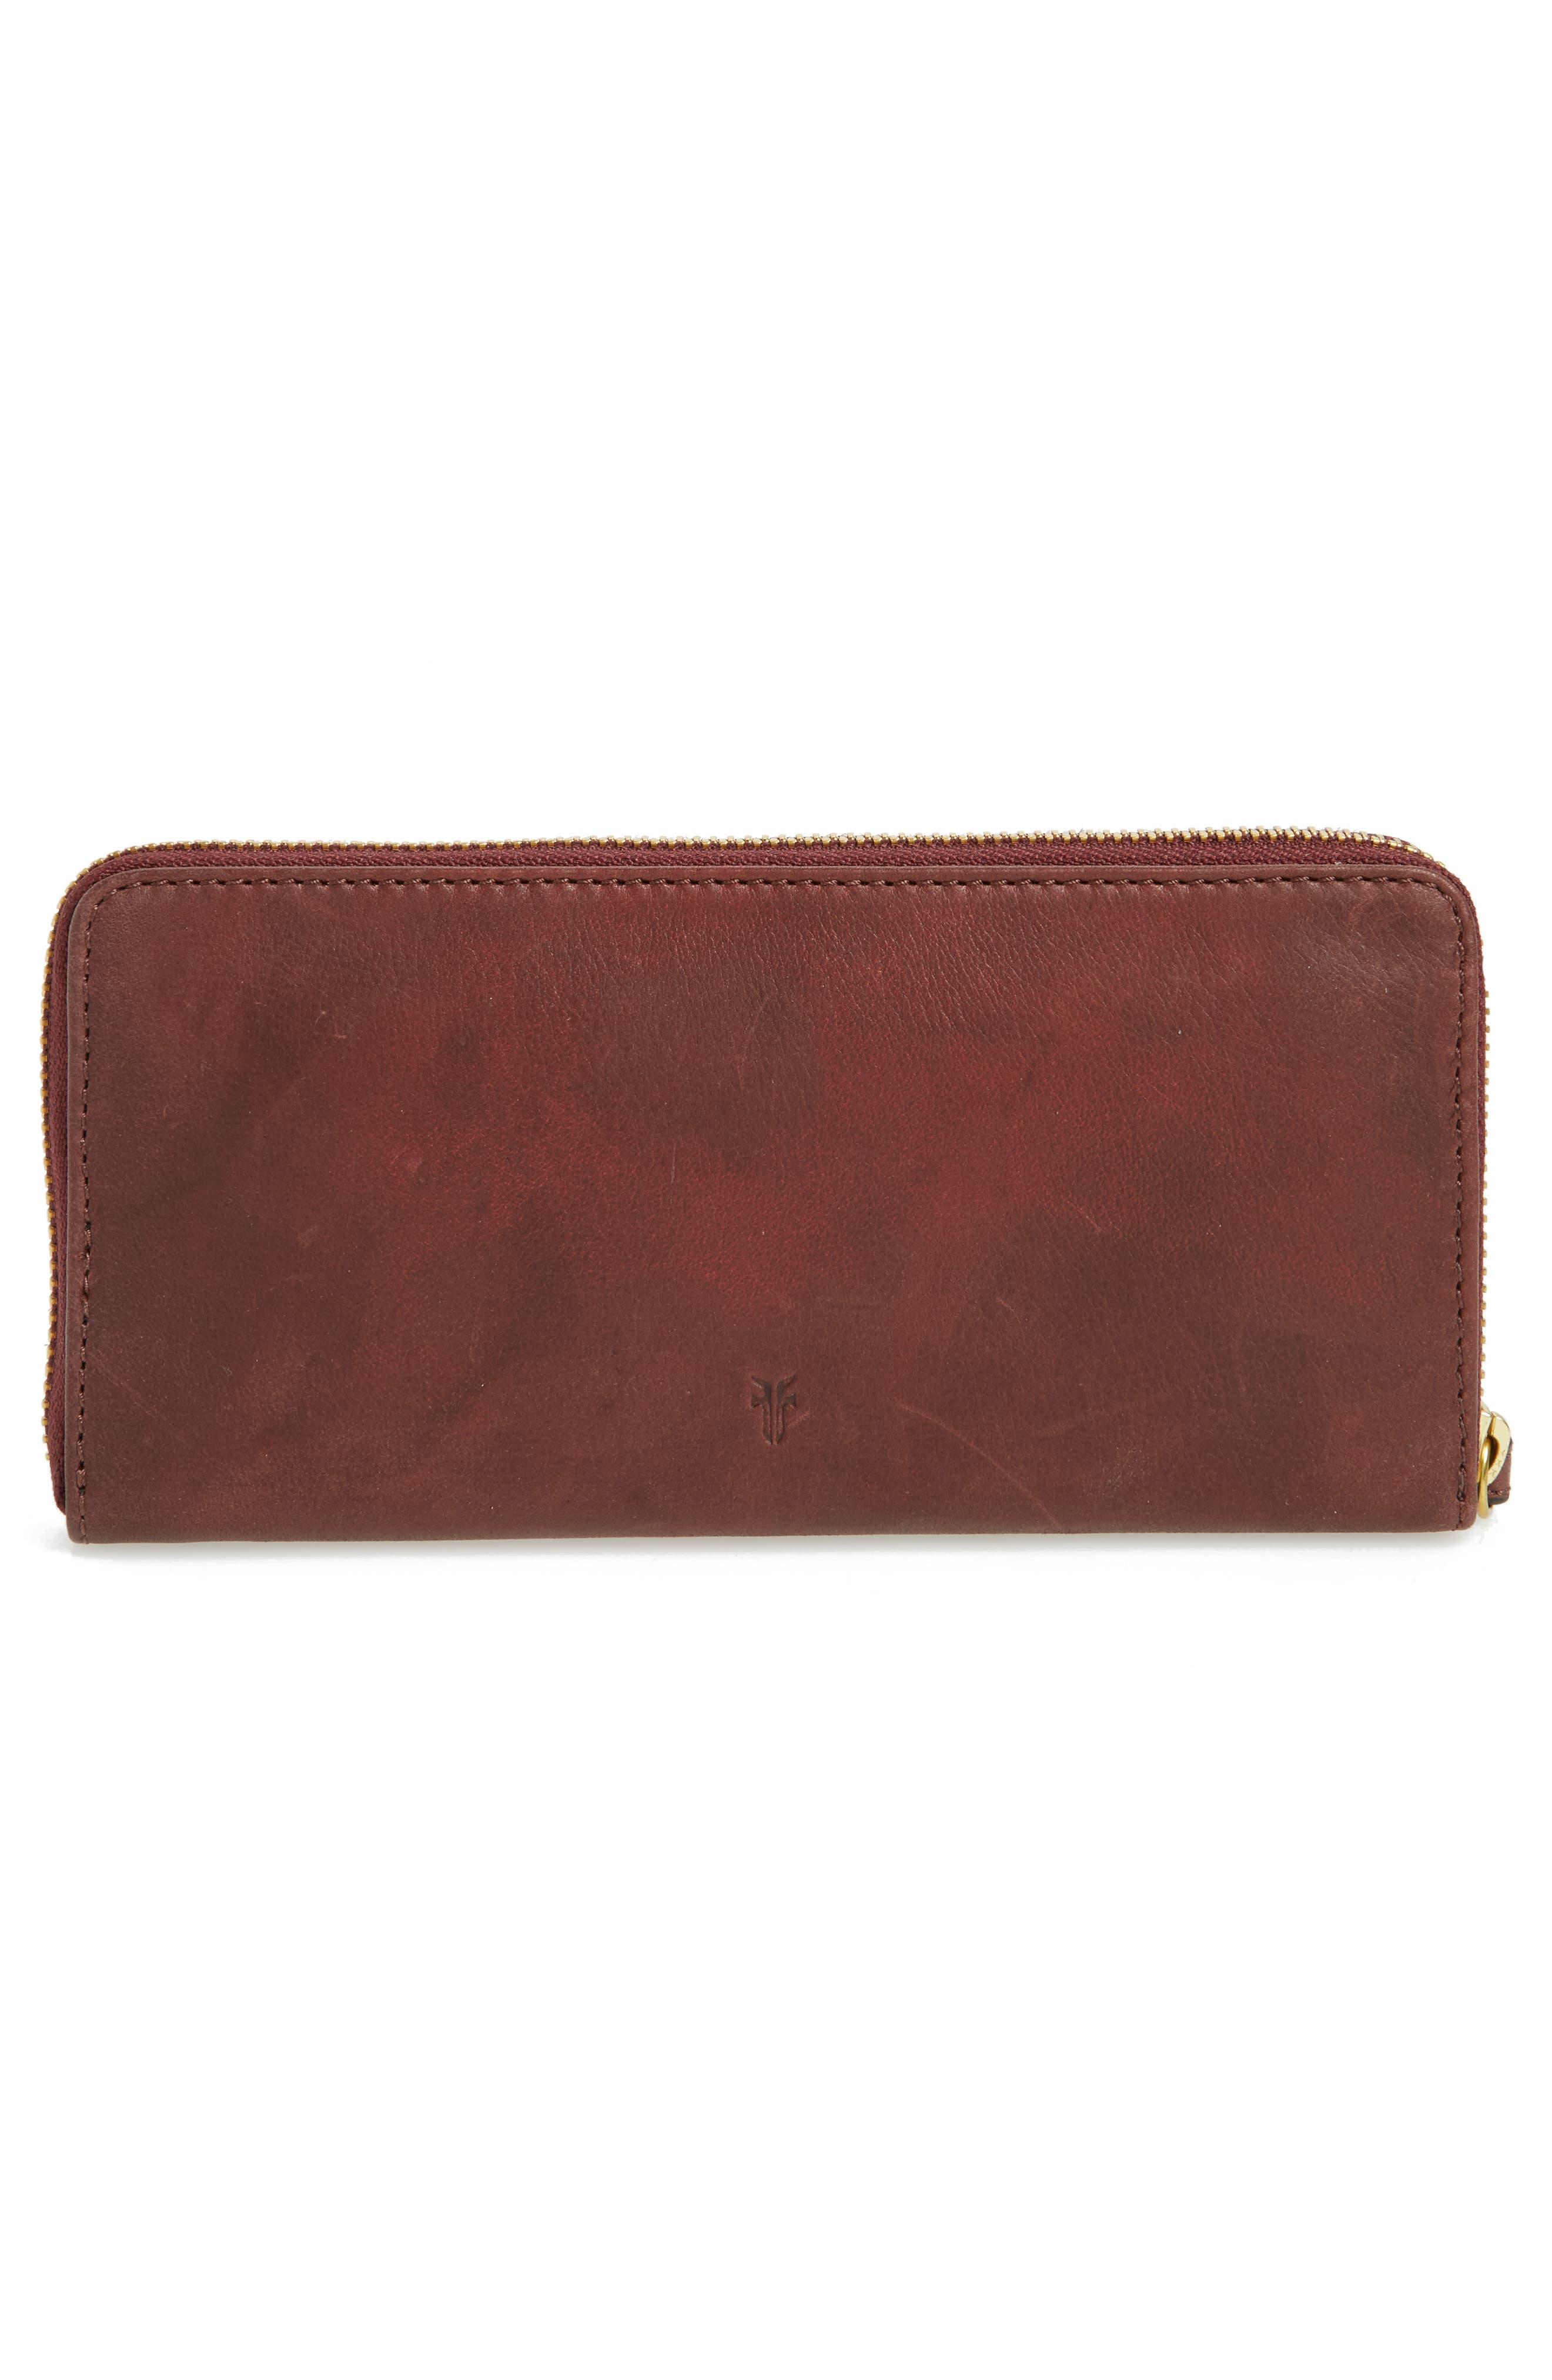 Alternate Image 3  - Frye Campus Rivet Leather Continental Zip Wallet